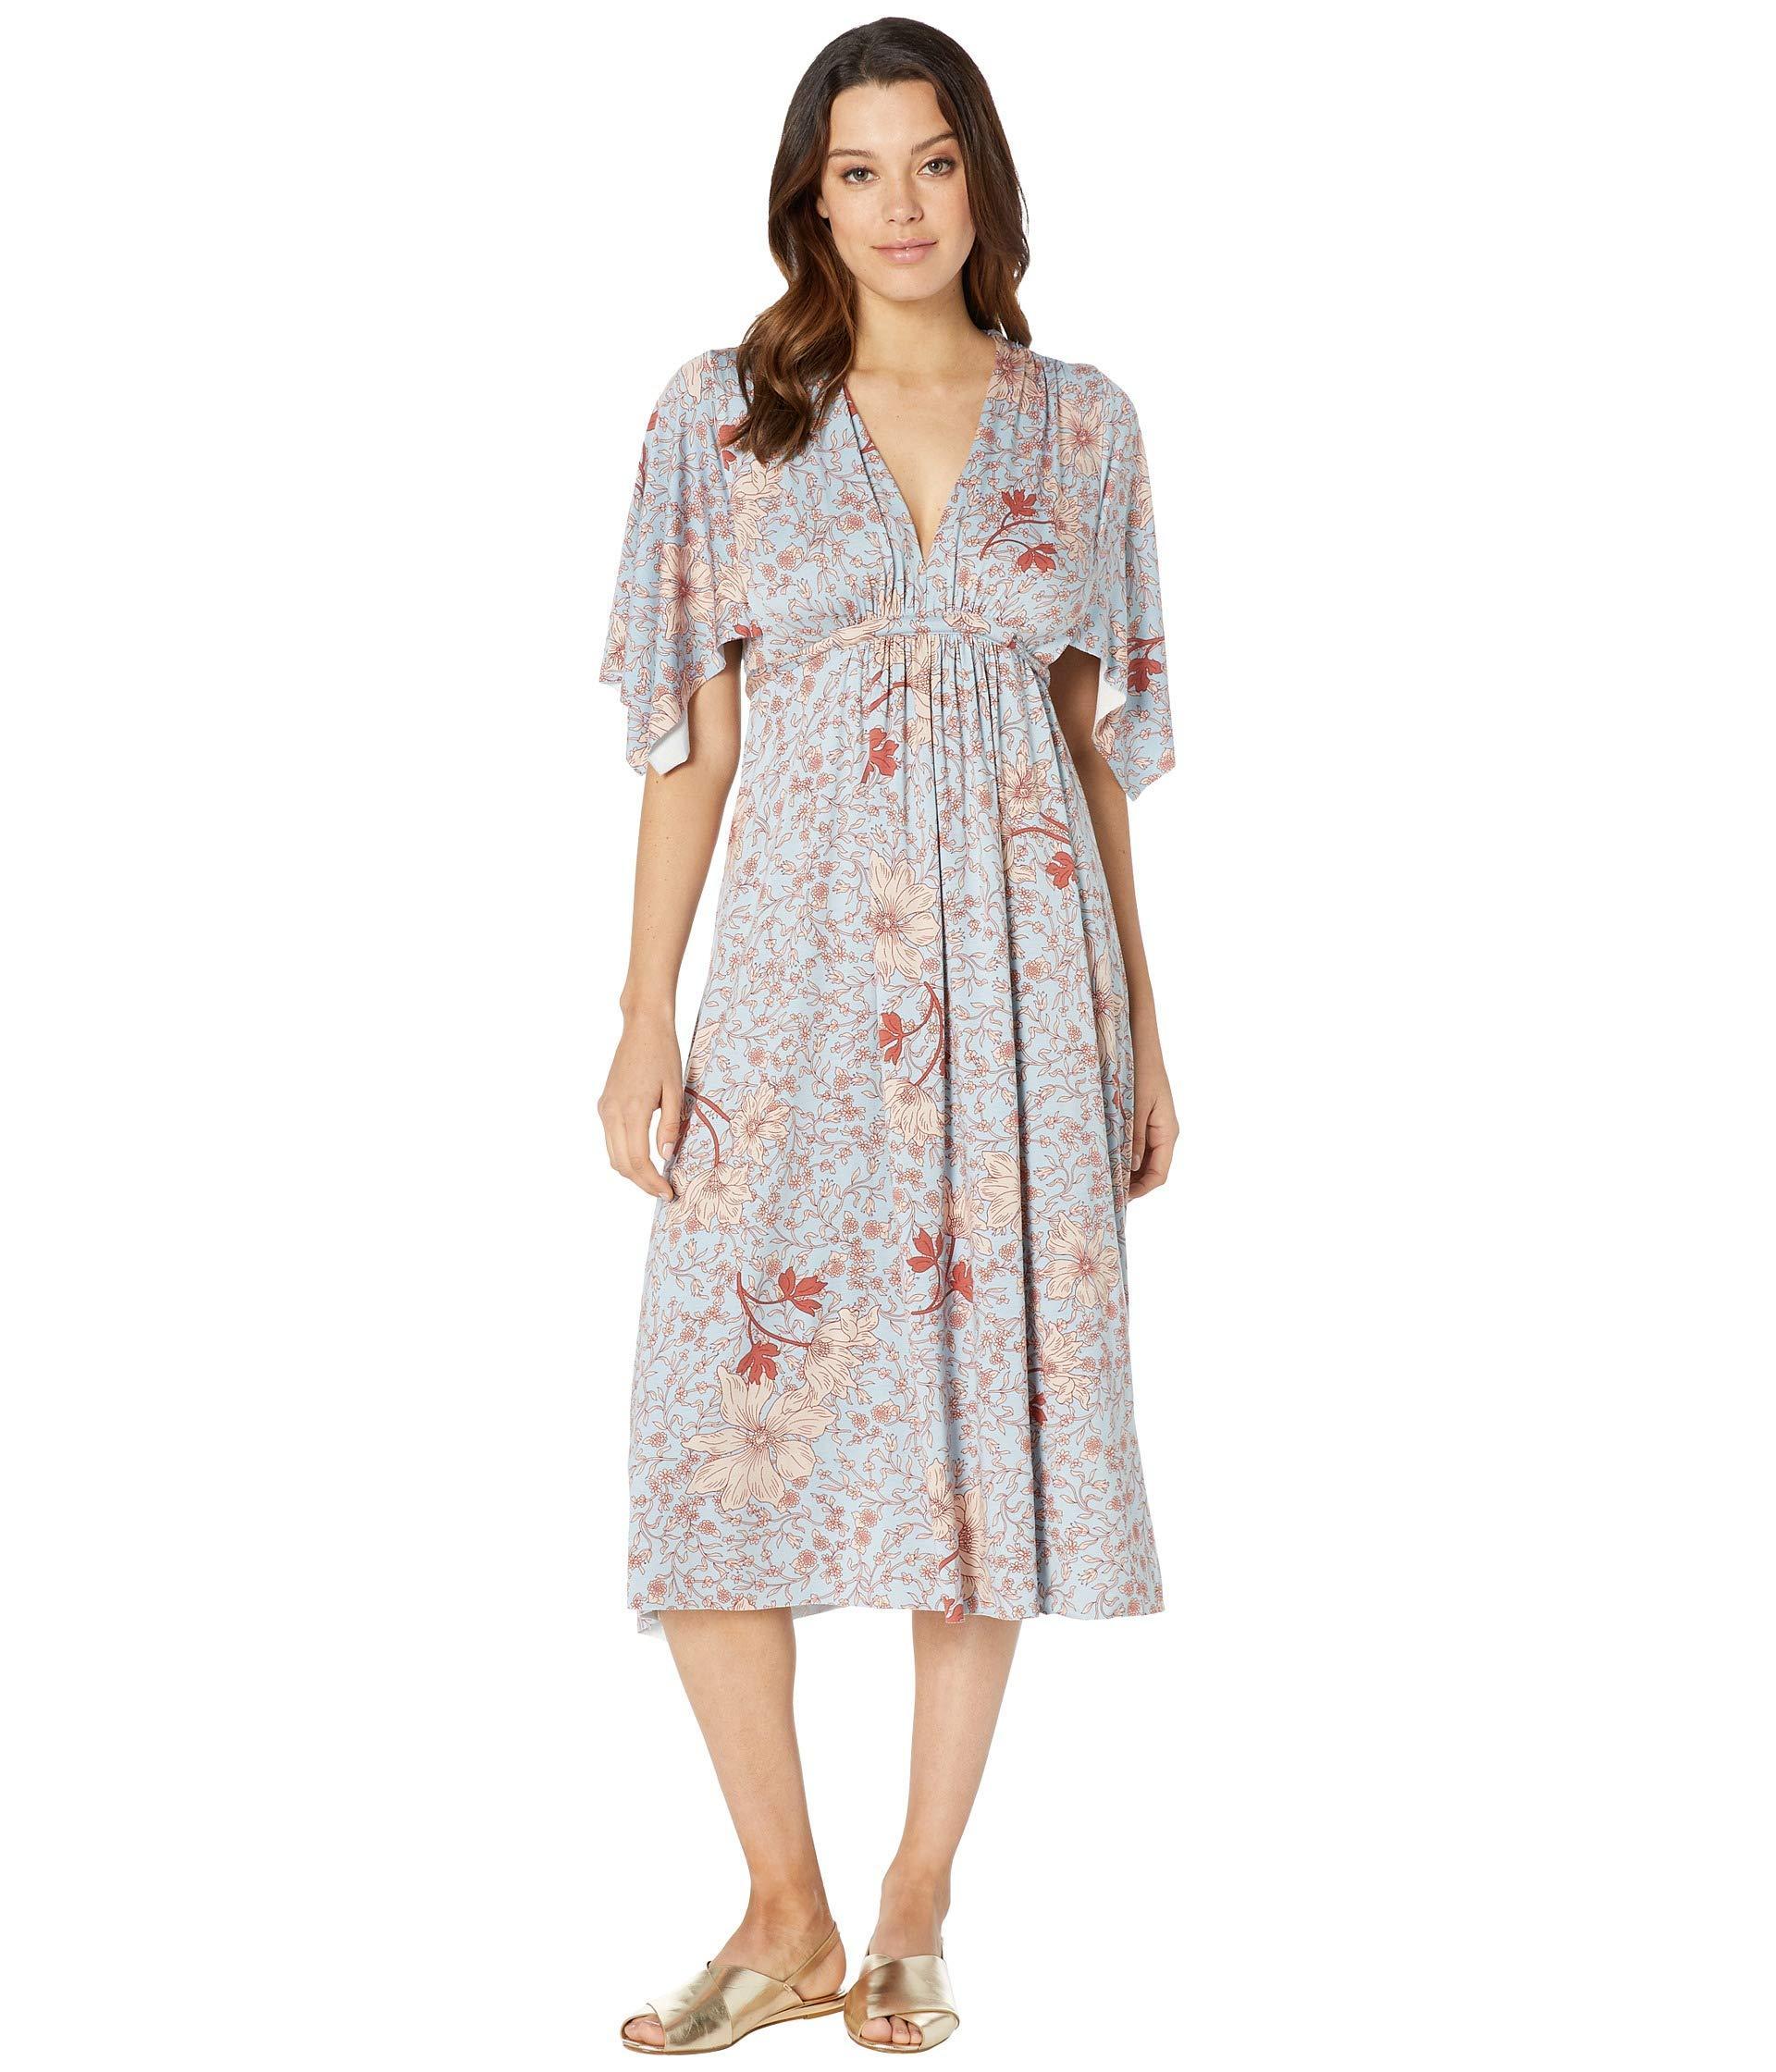 681eb3719a4e0 Lyst - Rachel Pally Mid-length Caftan Dress (striped Lily) Women's Dress